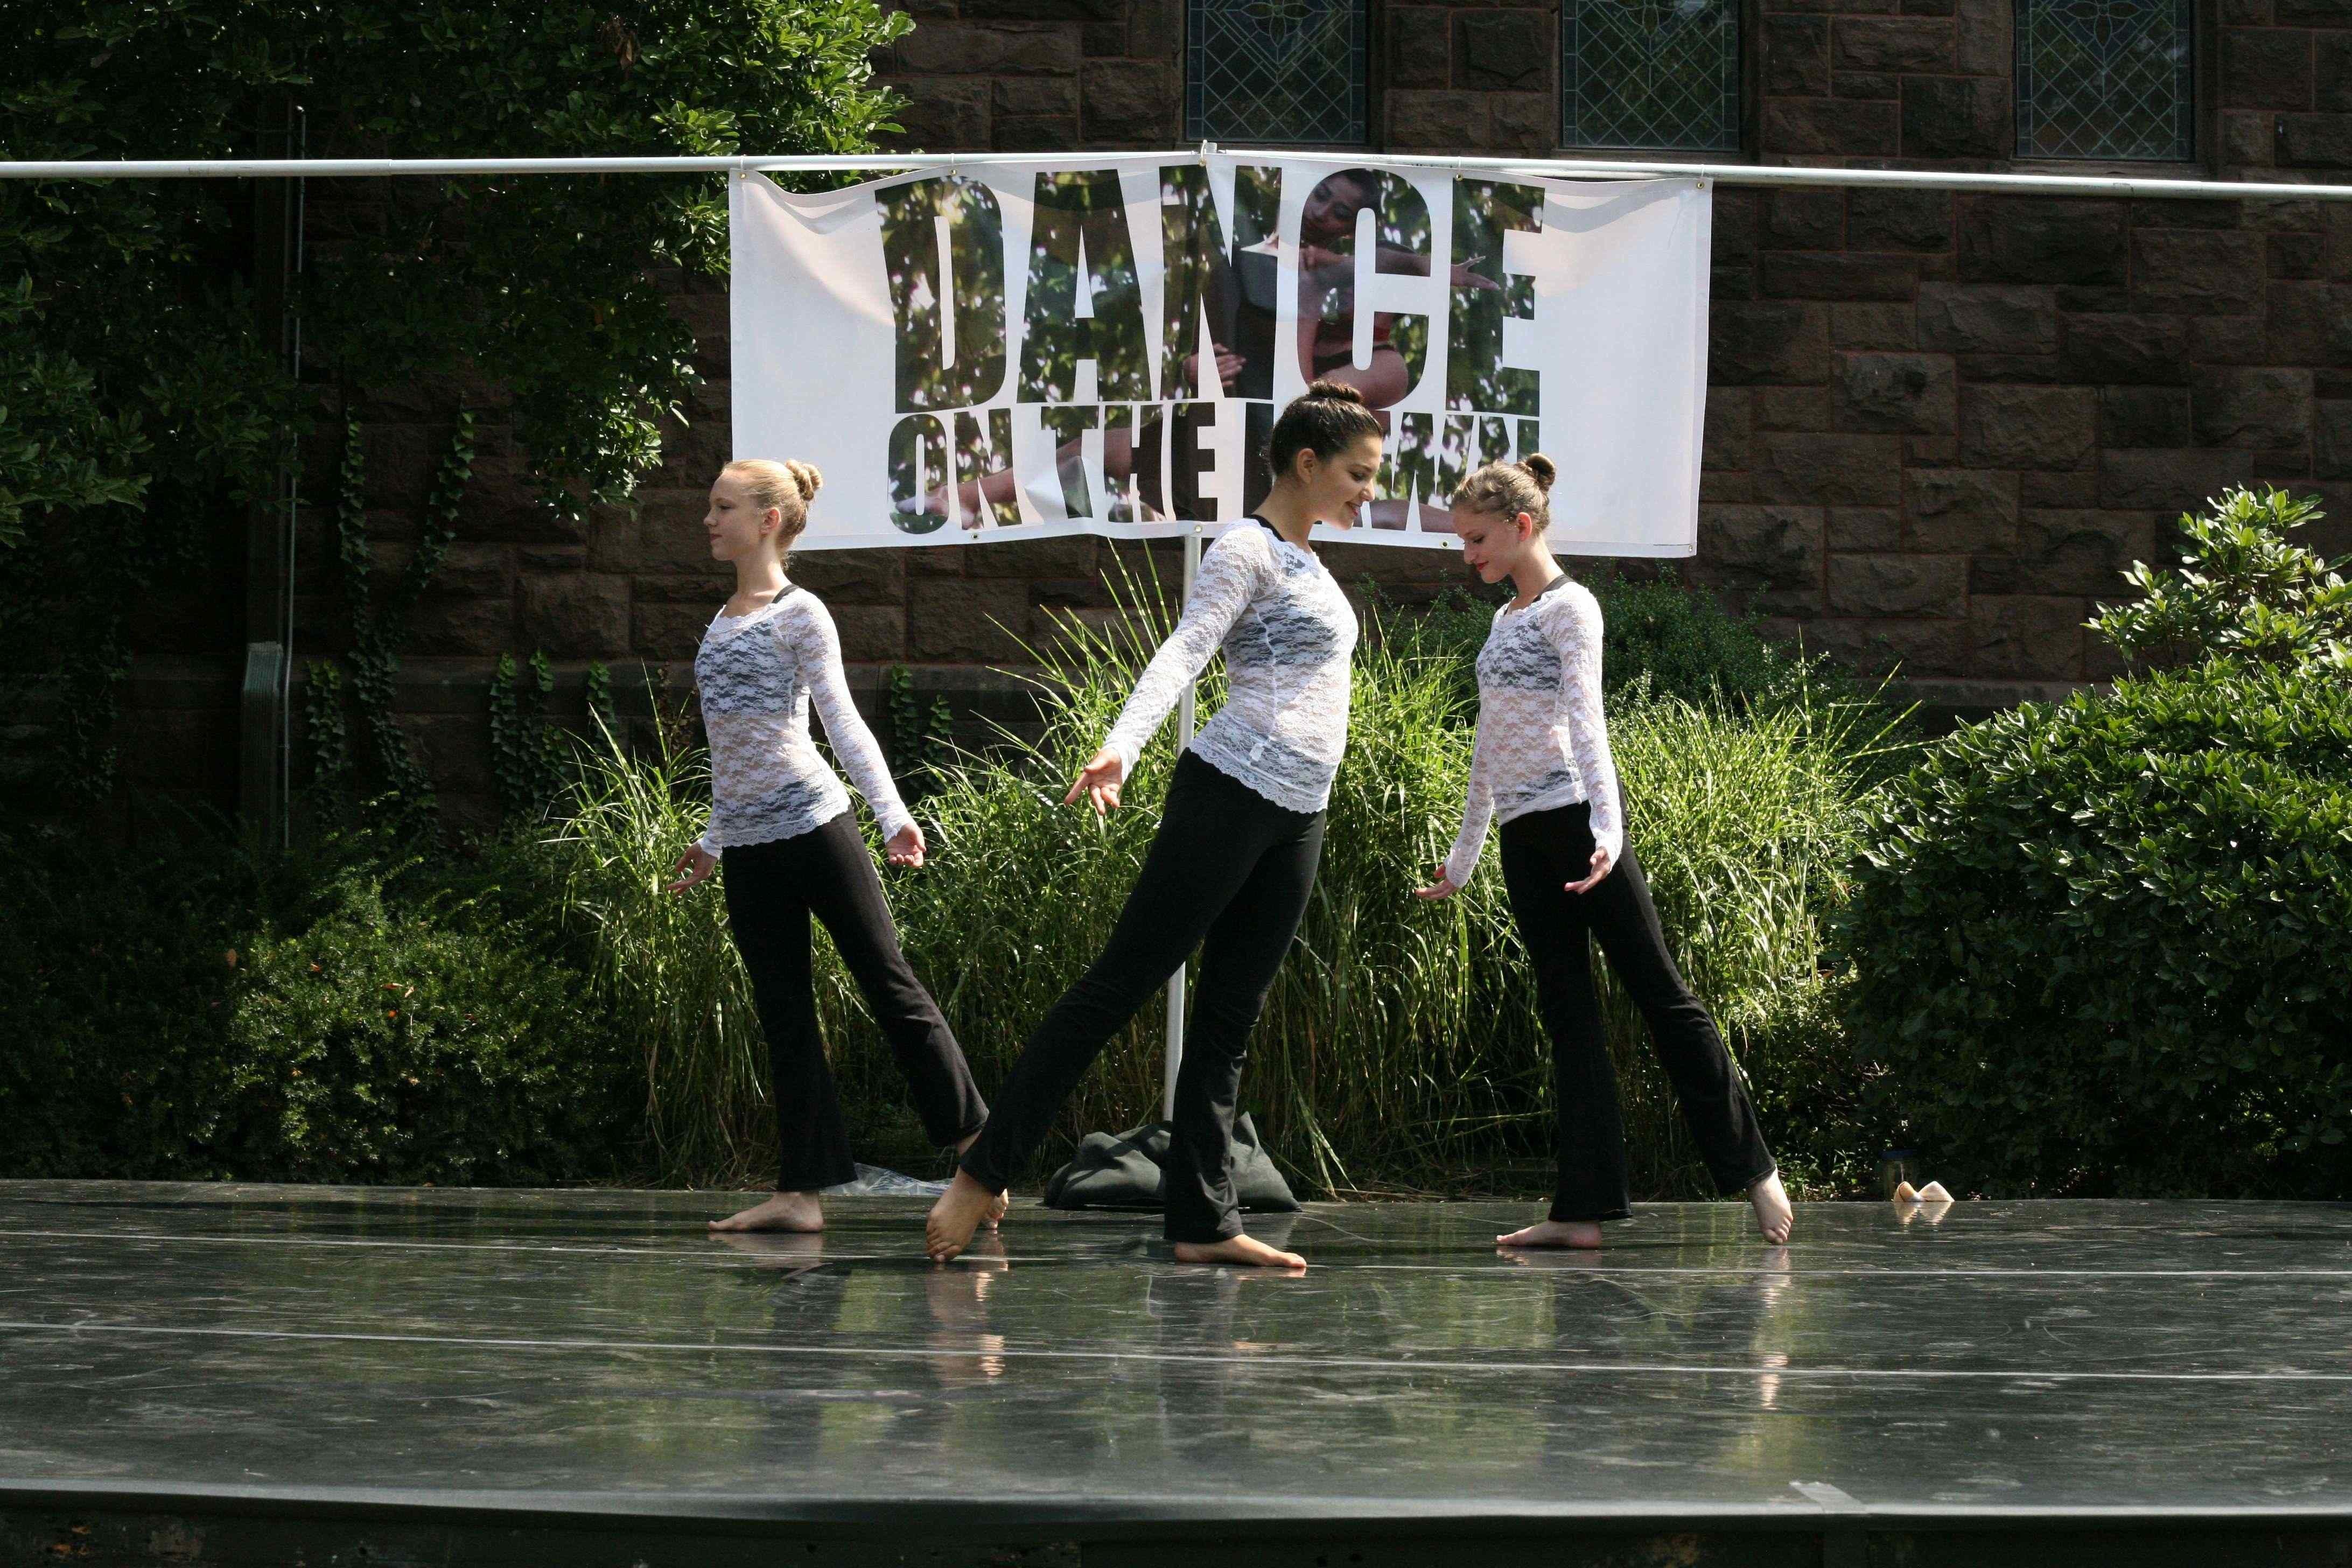 cb47b79e533e8fe9ca43_DANCE_ON_THE_LAWN.jpg